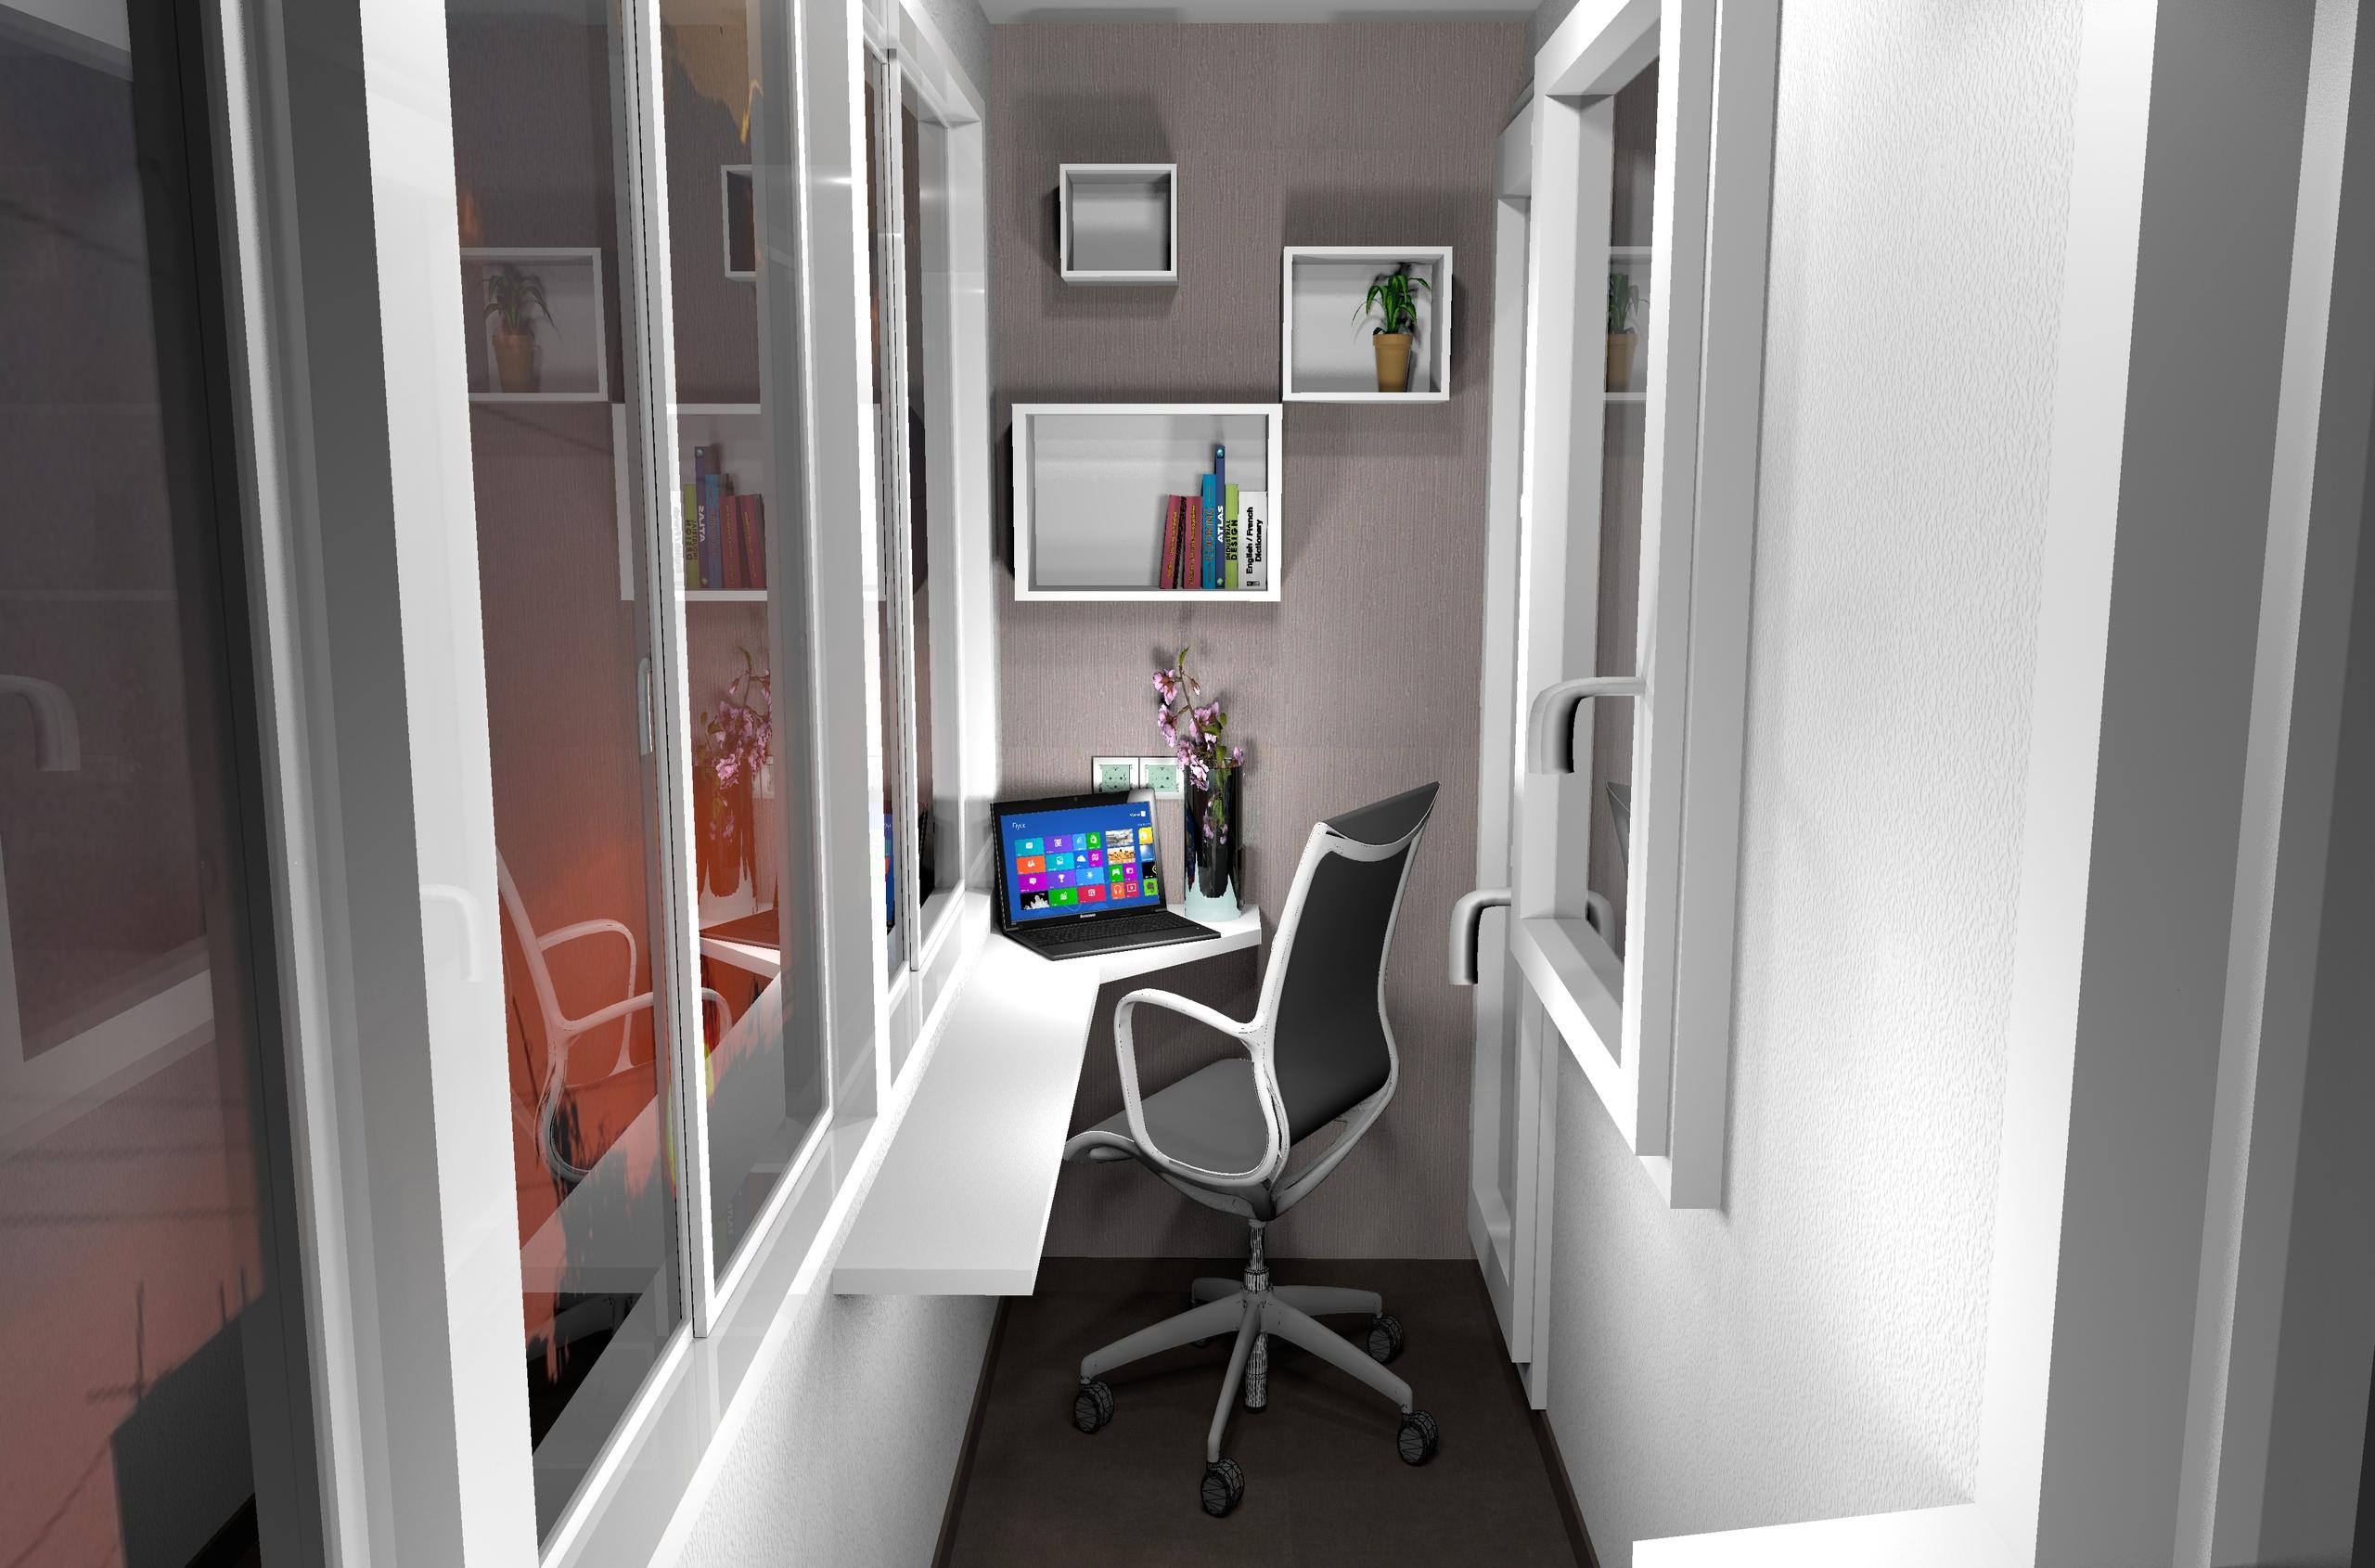 Проект квартиры-студии 26 кв/м .